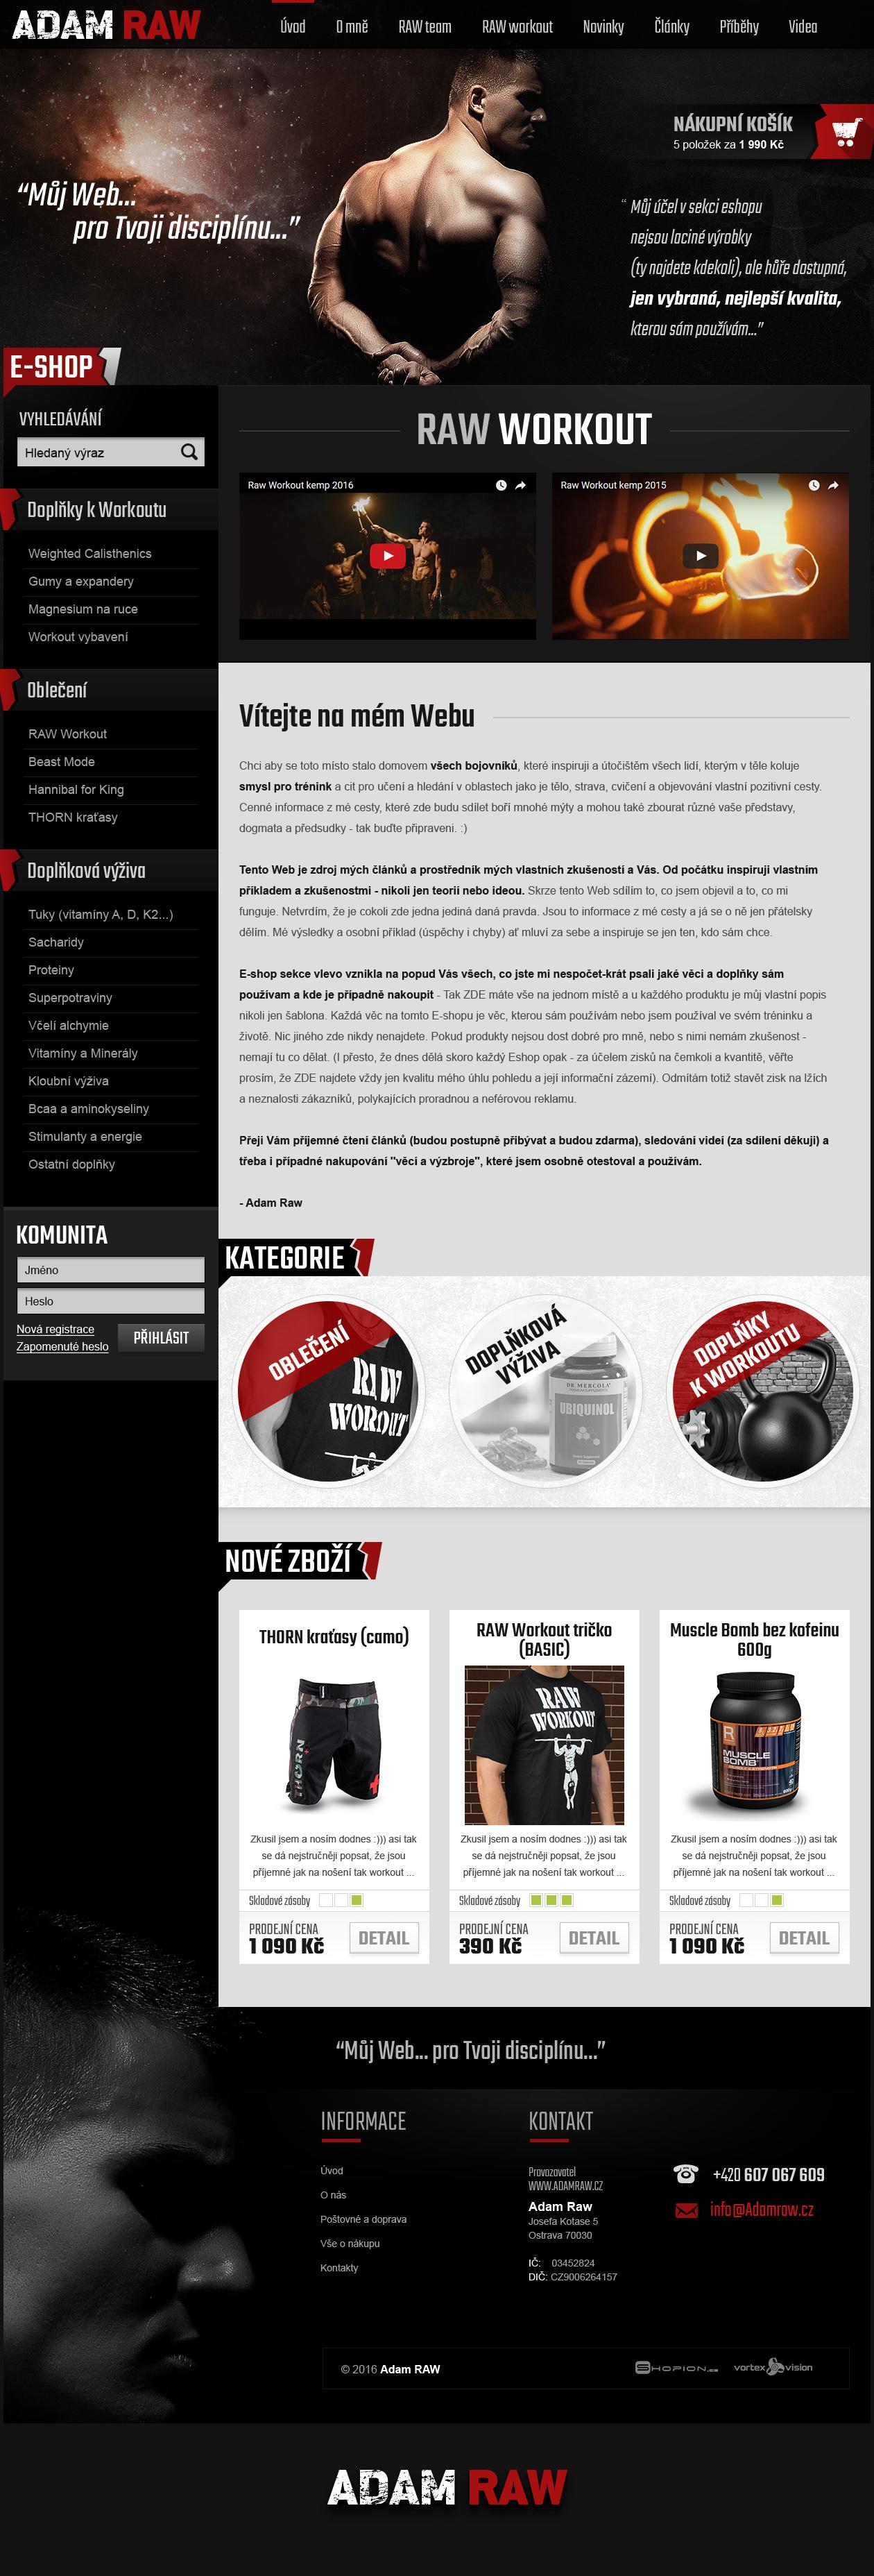 Internetový obchod .adamraw.cz